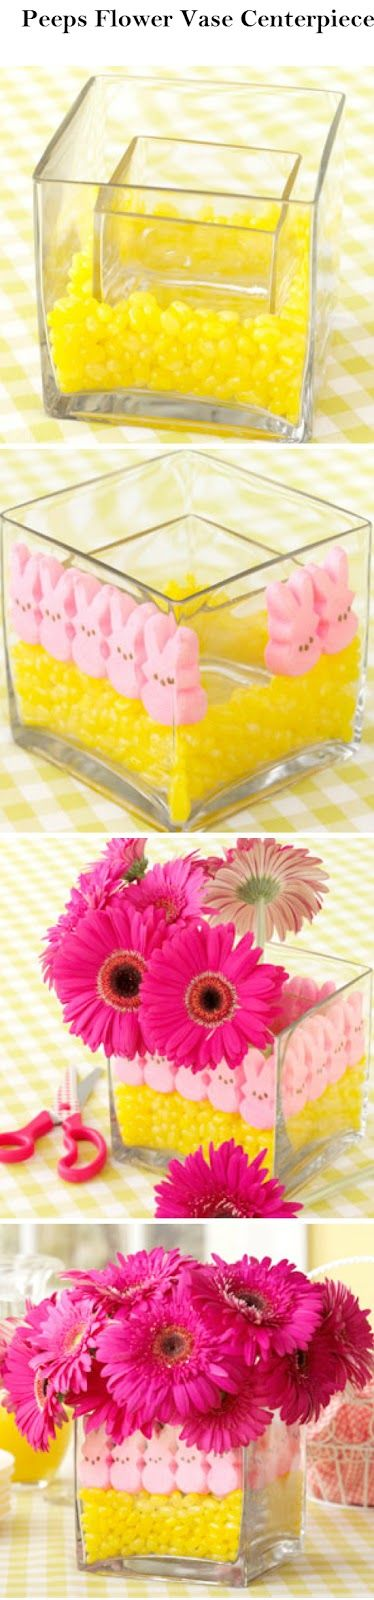 Peeps Flower Vase Centerpiece